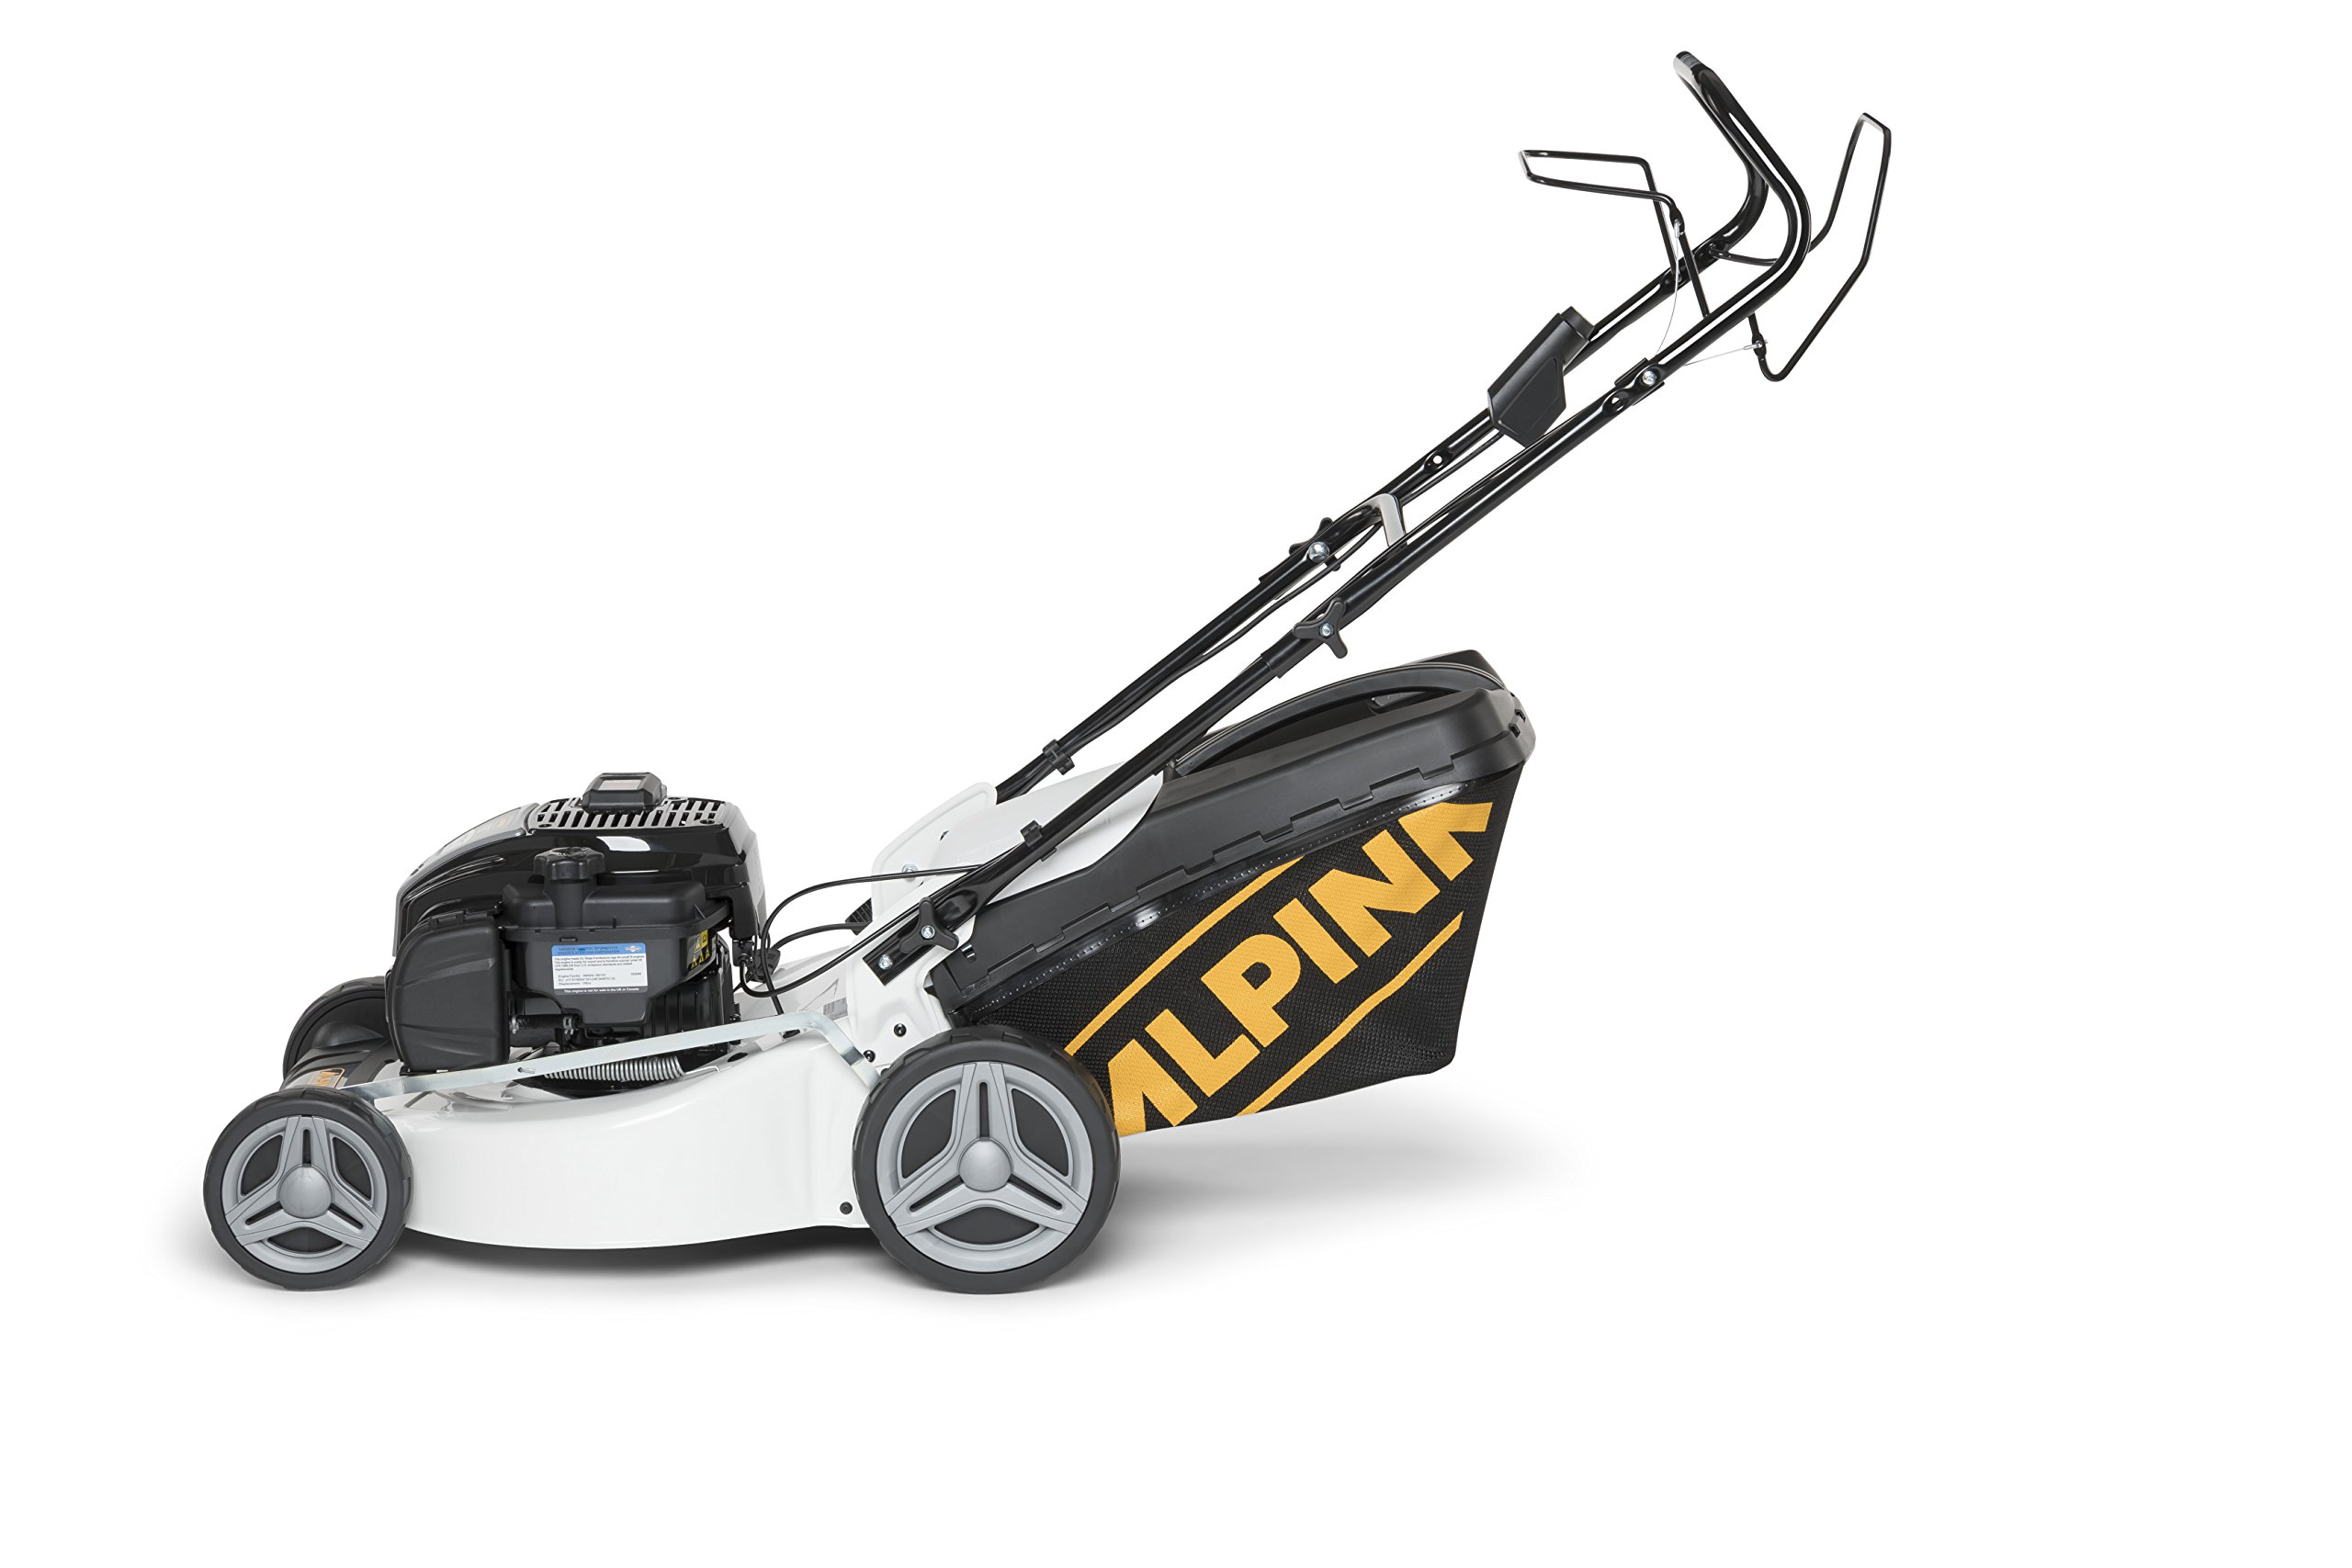 Alpina-295486520A18-Benzin-Rasenmher-150-cc-Schnittbreite-46-cm-Fangkorb-60-L-Mulchen-AL3-46-SBE